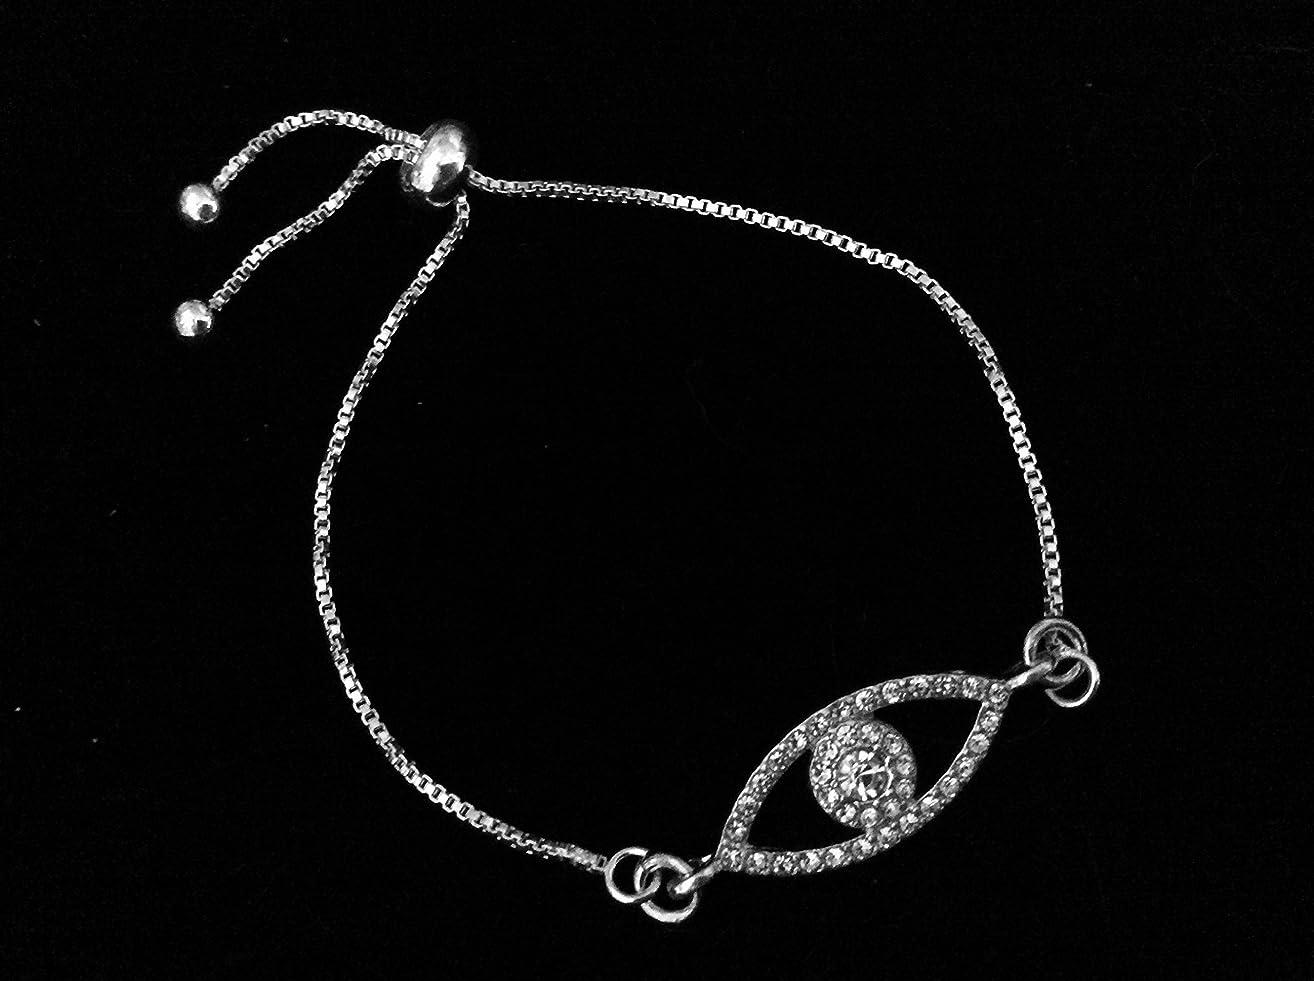 Crystal Evil Eye Bolo Bracelet Silver Adjustable Bracelet Gift One Size Fits All Charm Bracelet Good Luck Message Jewelry